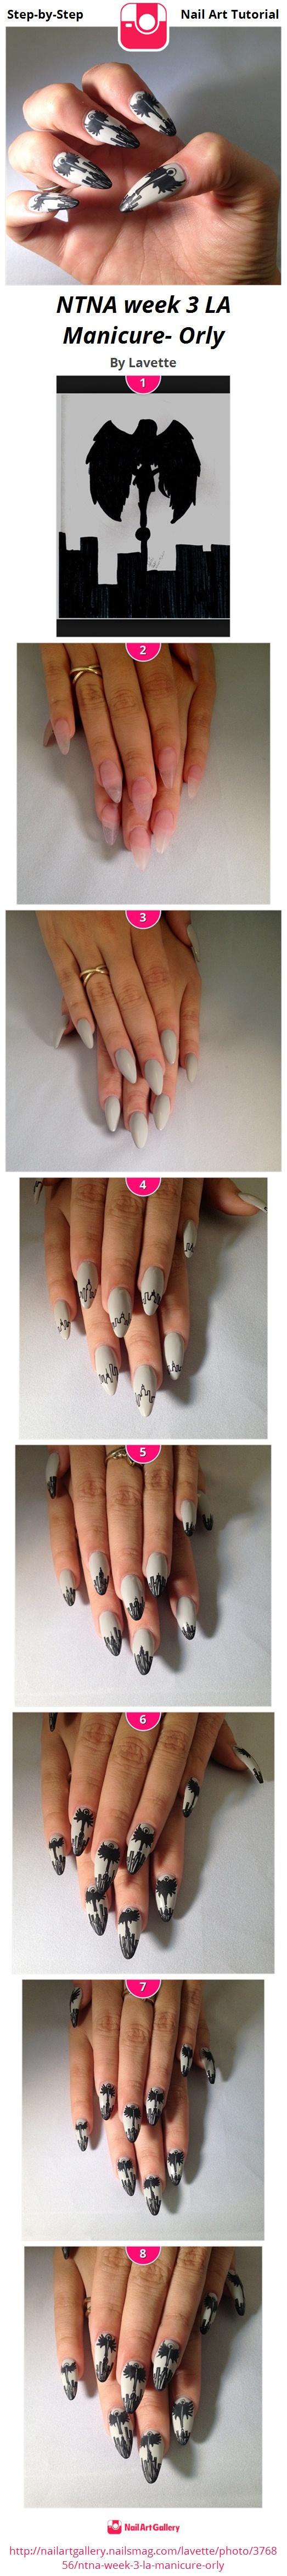 NTNA week 3 LA Manicure- Orly - Nail Art Gallery